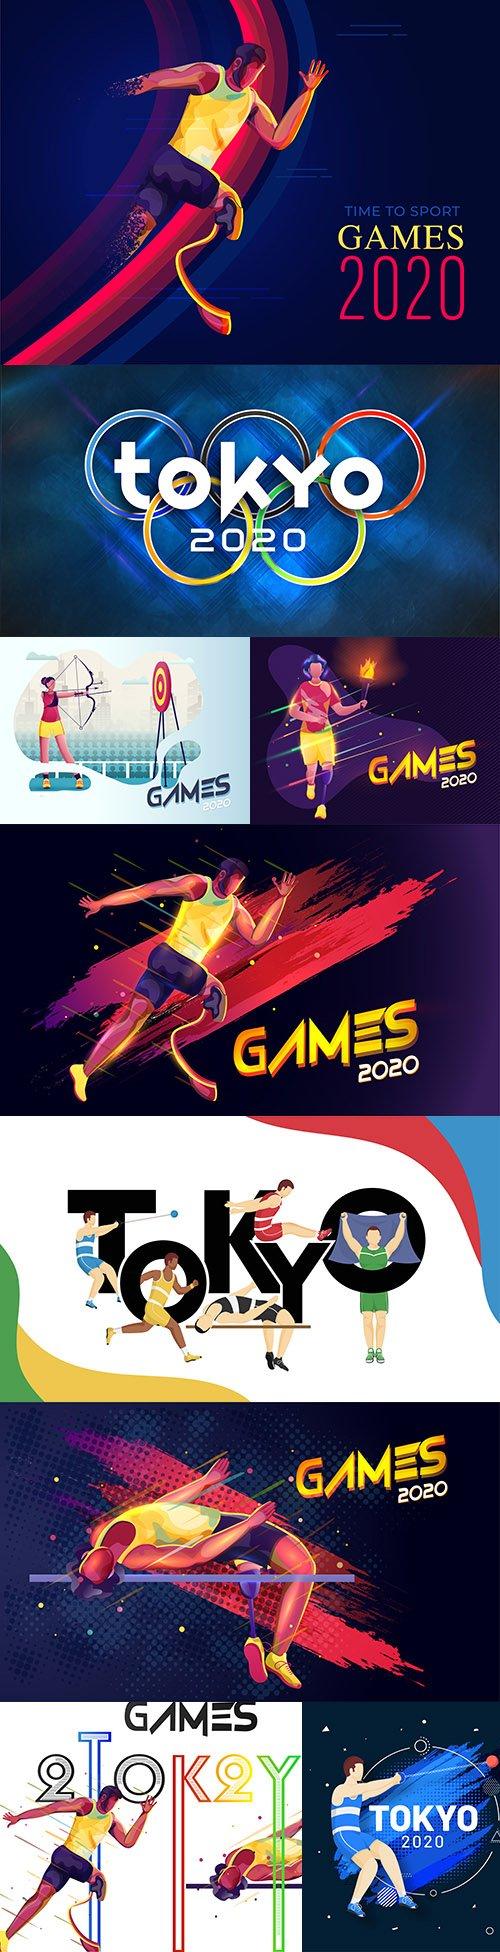 Tokyo 2020 Olympic Games symbol sports design